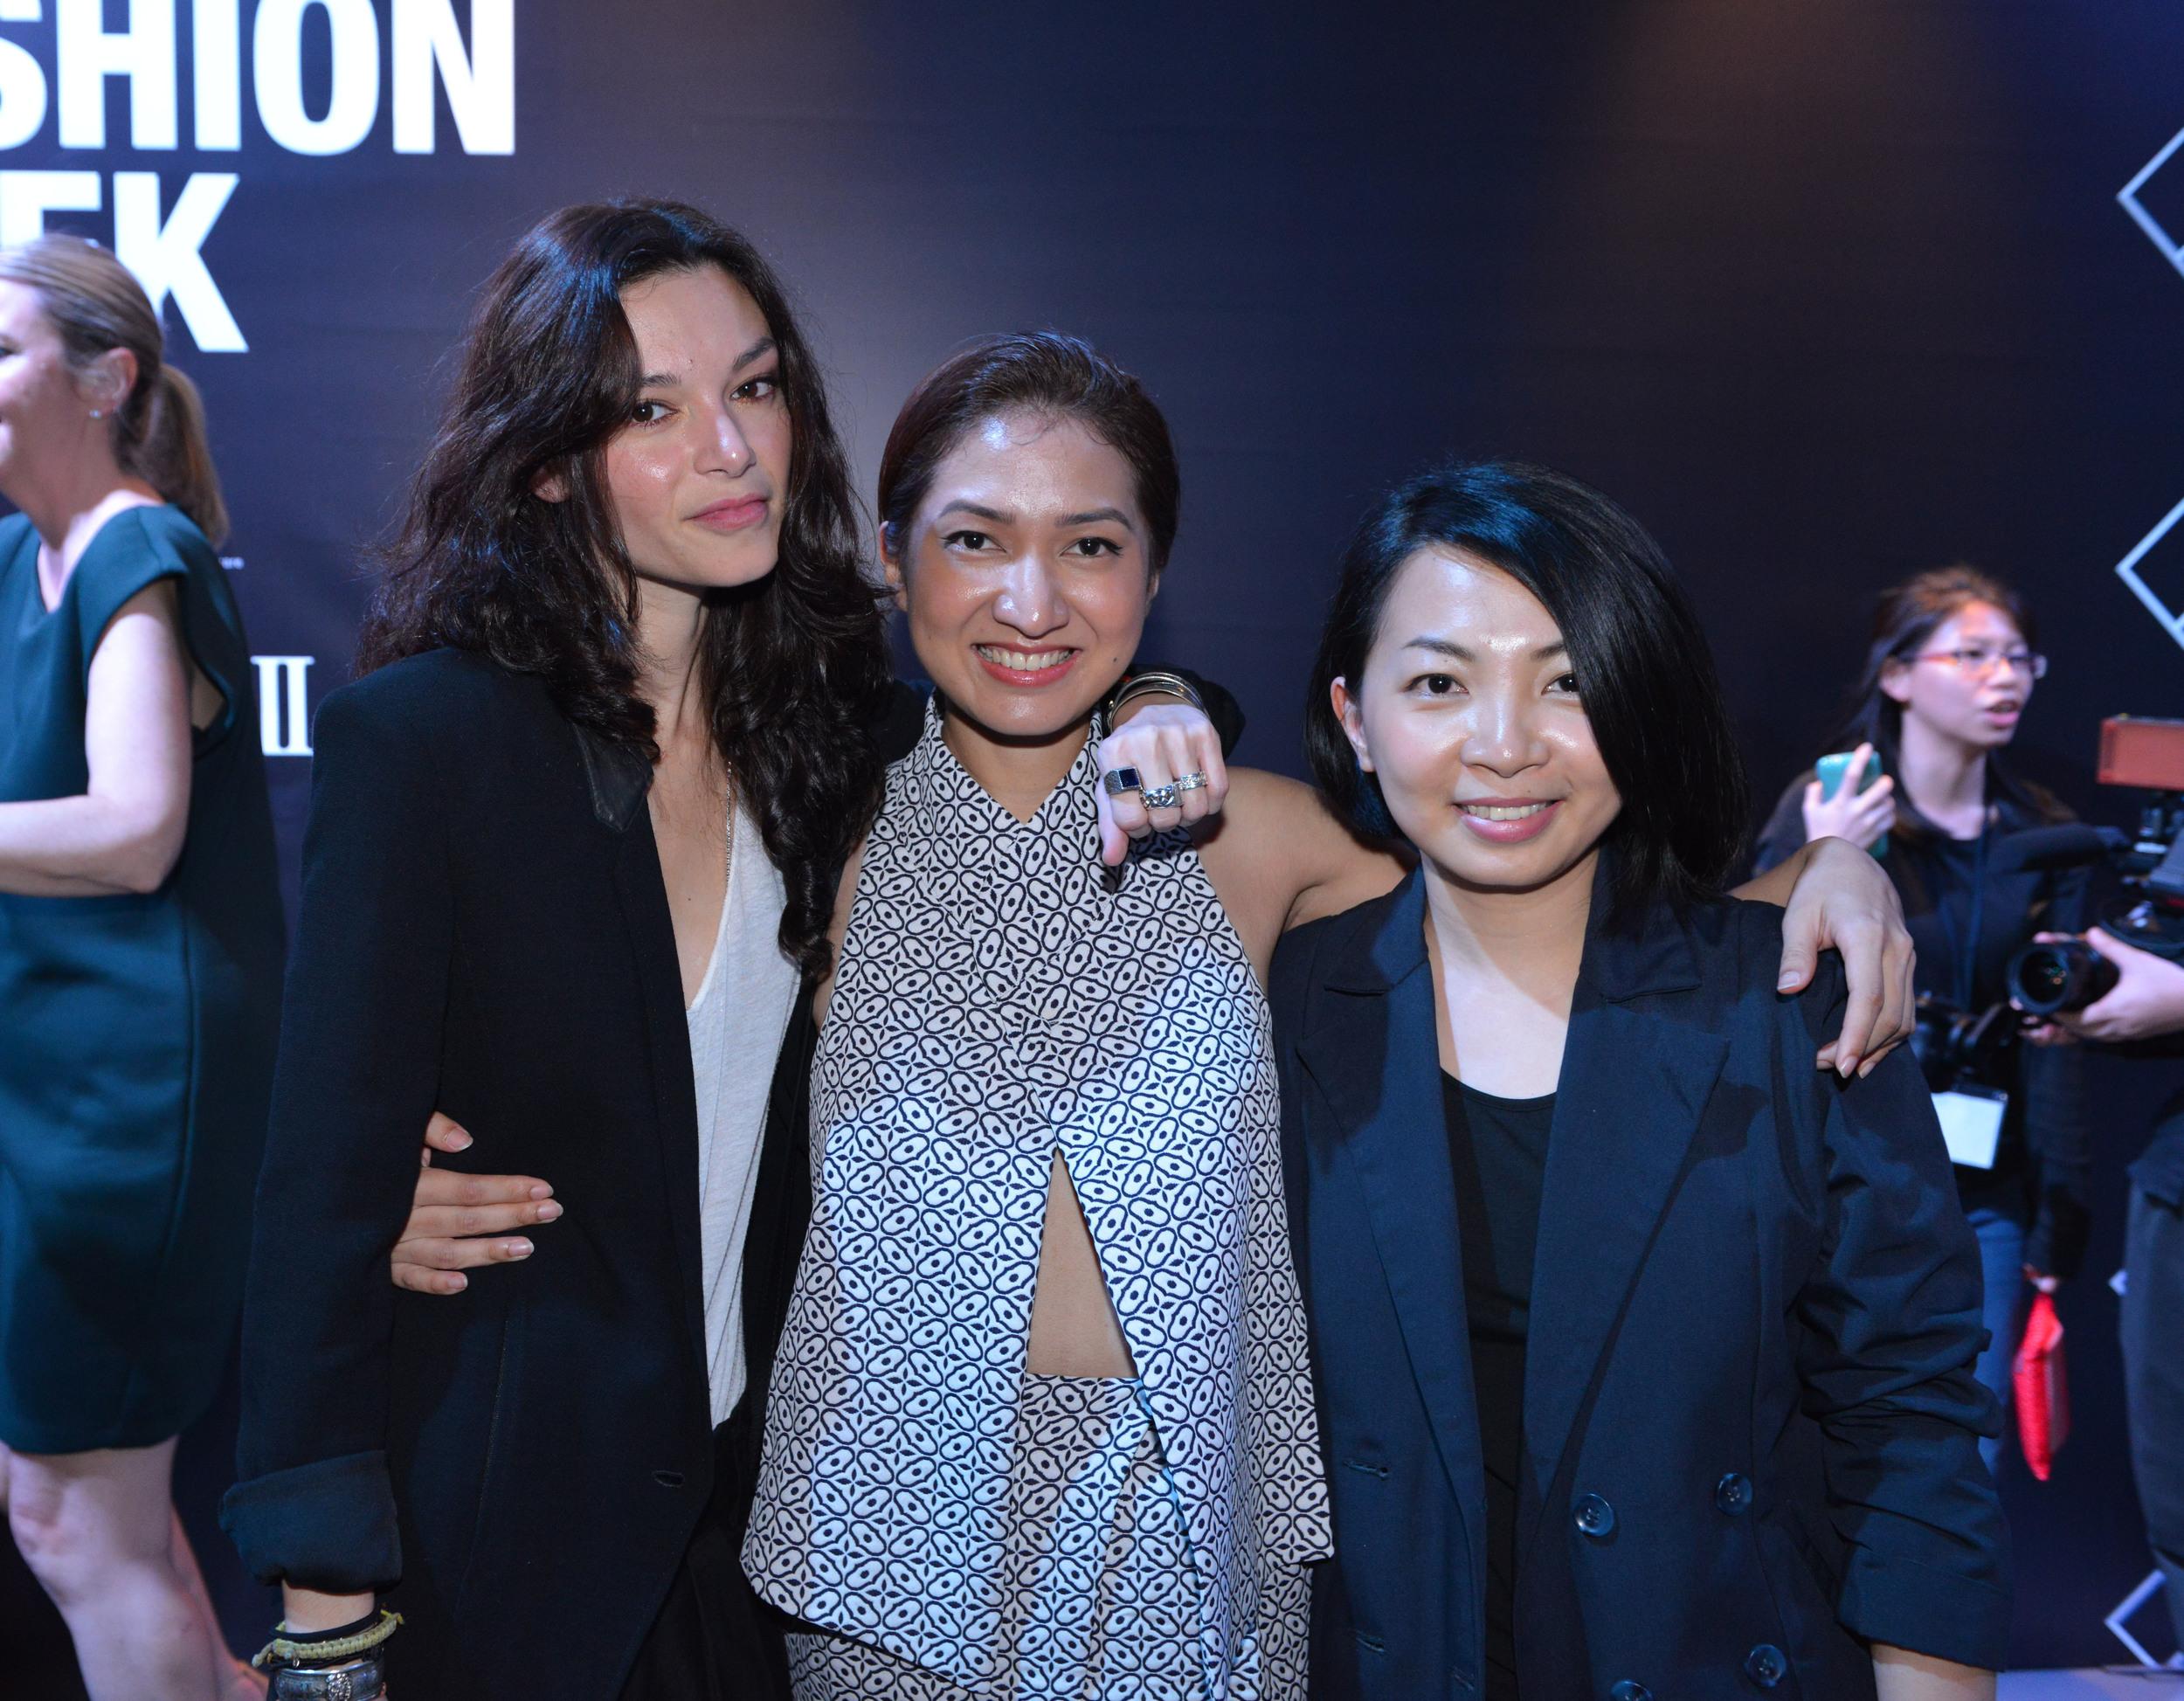 Singaporean designers Chelsea Scott-Blackhall of Dzojchen, Priscilla Shunmugam of Ong Shunmugam, and Sabrina Goh of Elohim (Credit: Adrian Thoo)